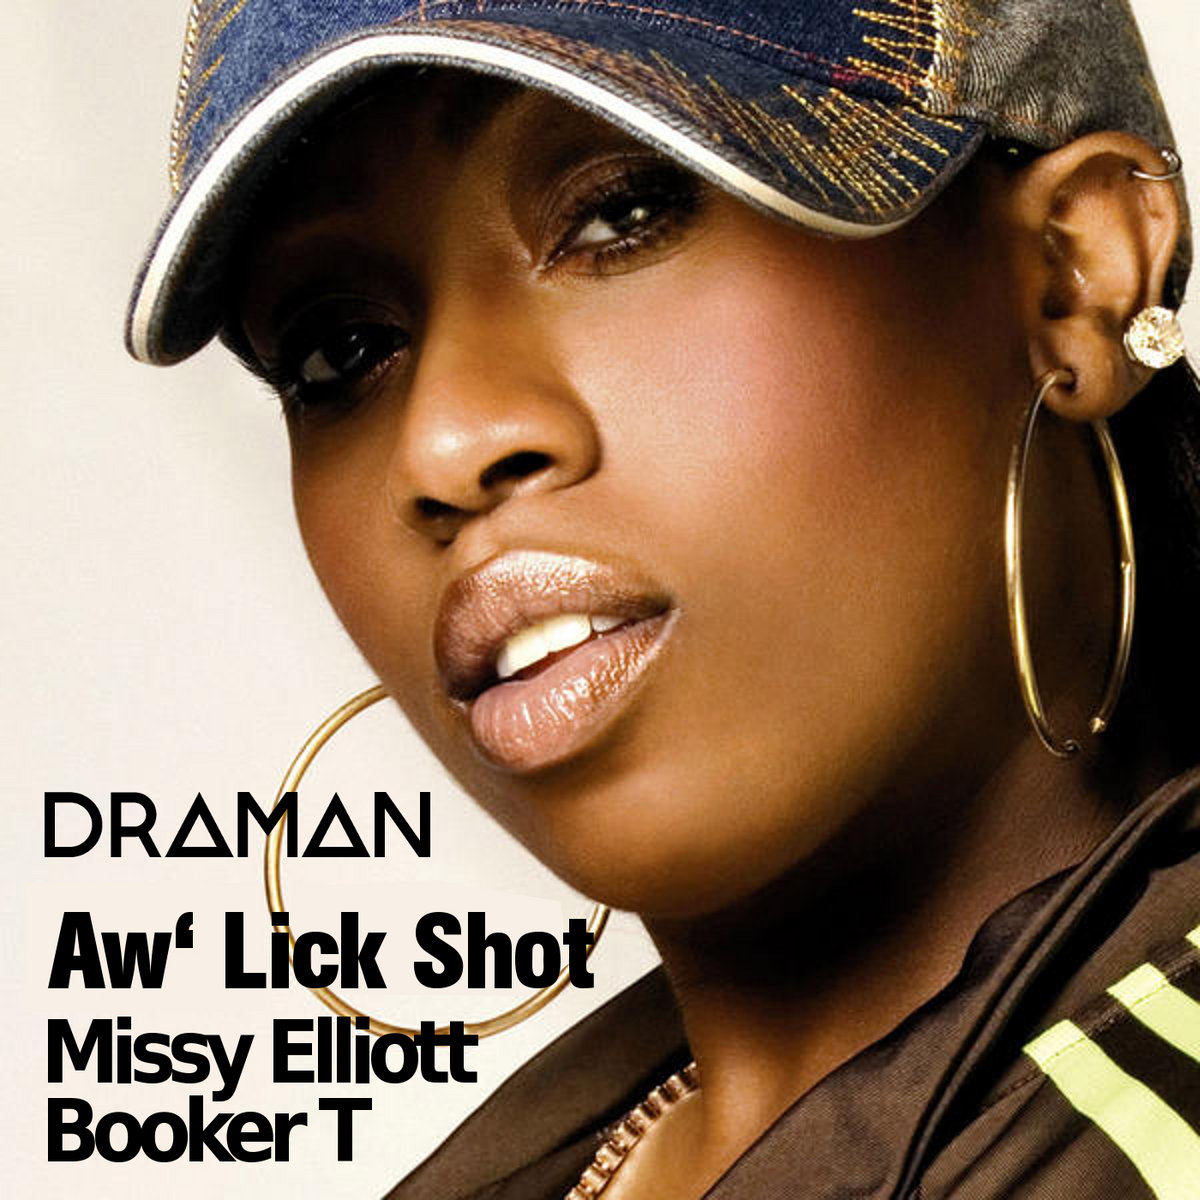 Lick shot missy elliott